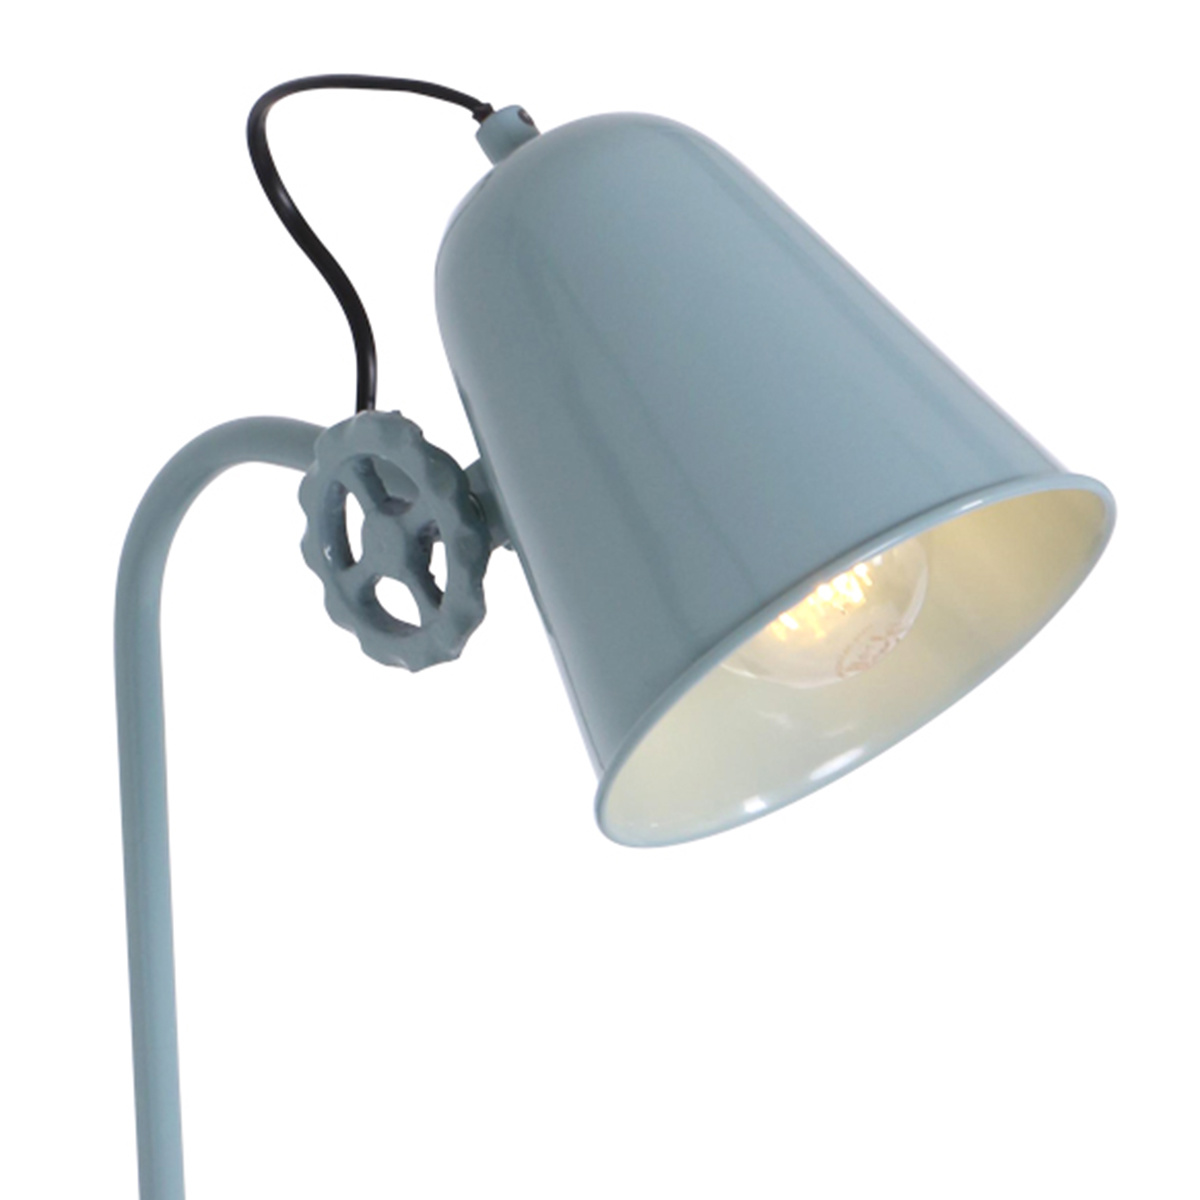 Anne Light & home Tafellamp dolphin groen